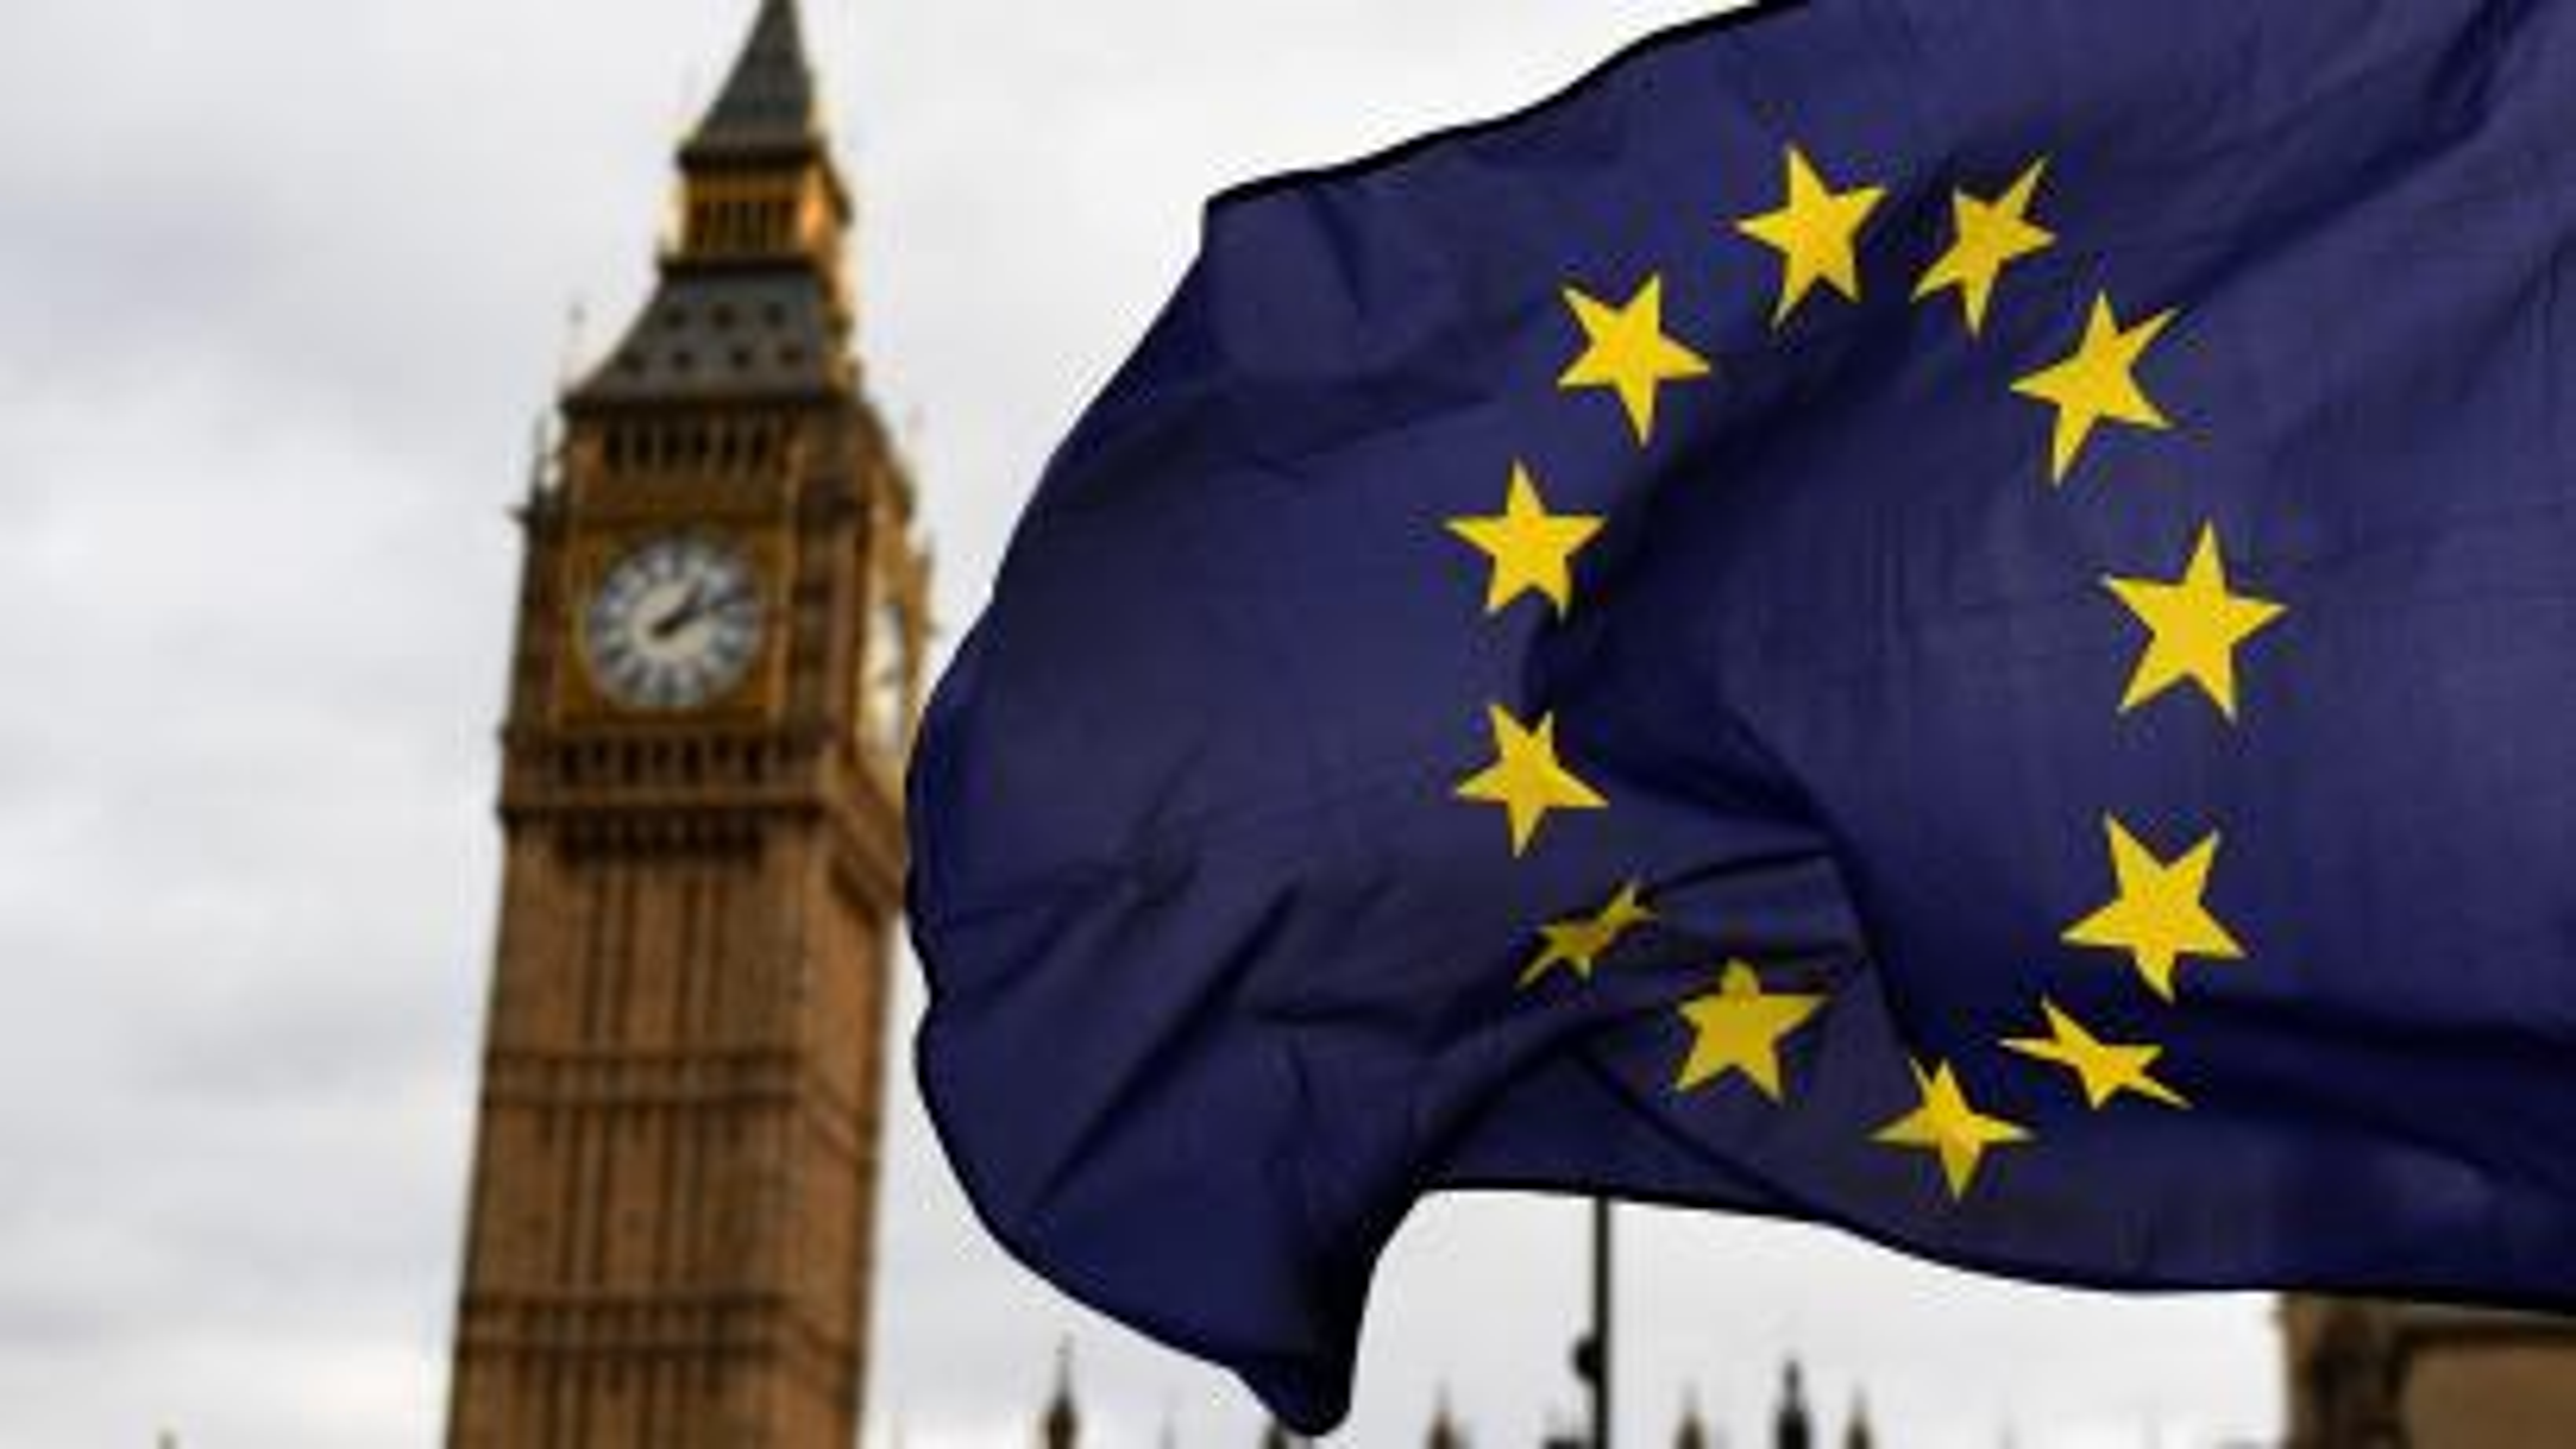 EU Migrants protest outside parliament in London